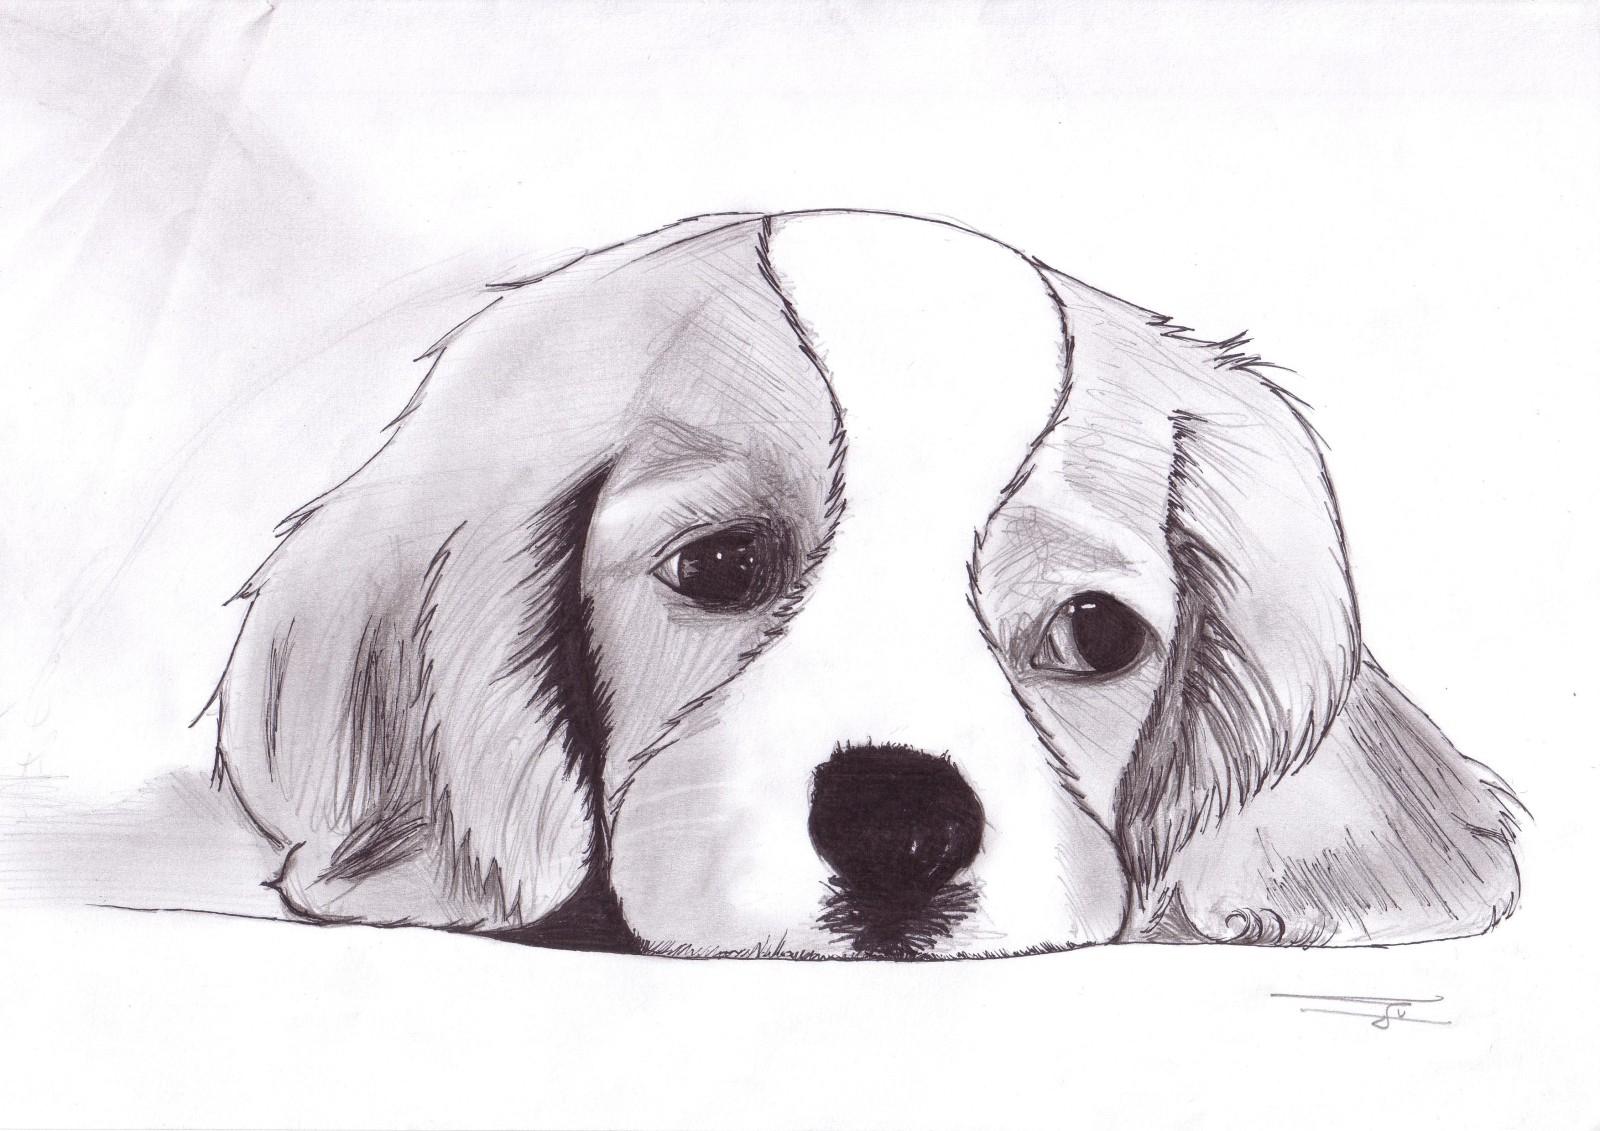 Portrait D'animal - Goupi serapportantà Image De Dessin A Reproduire